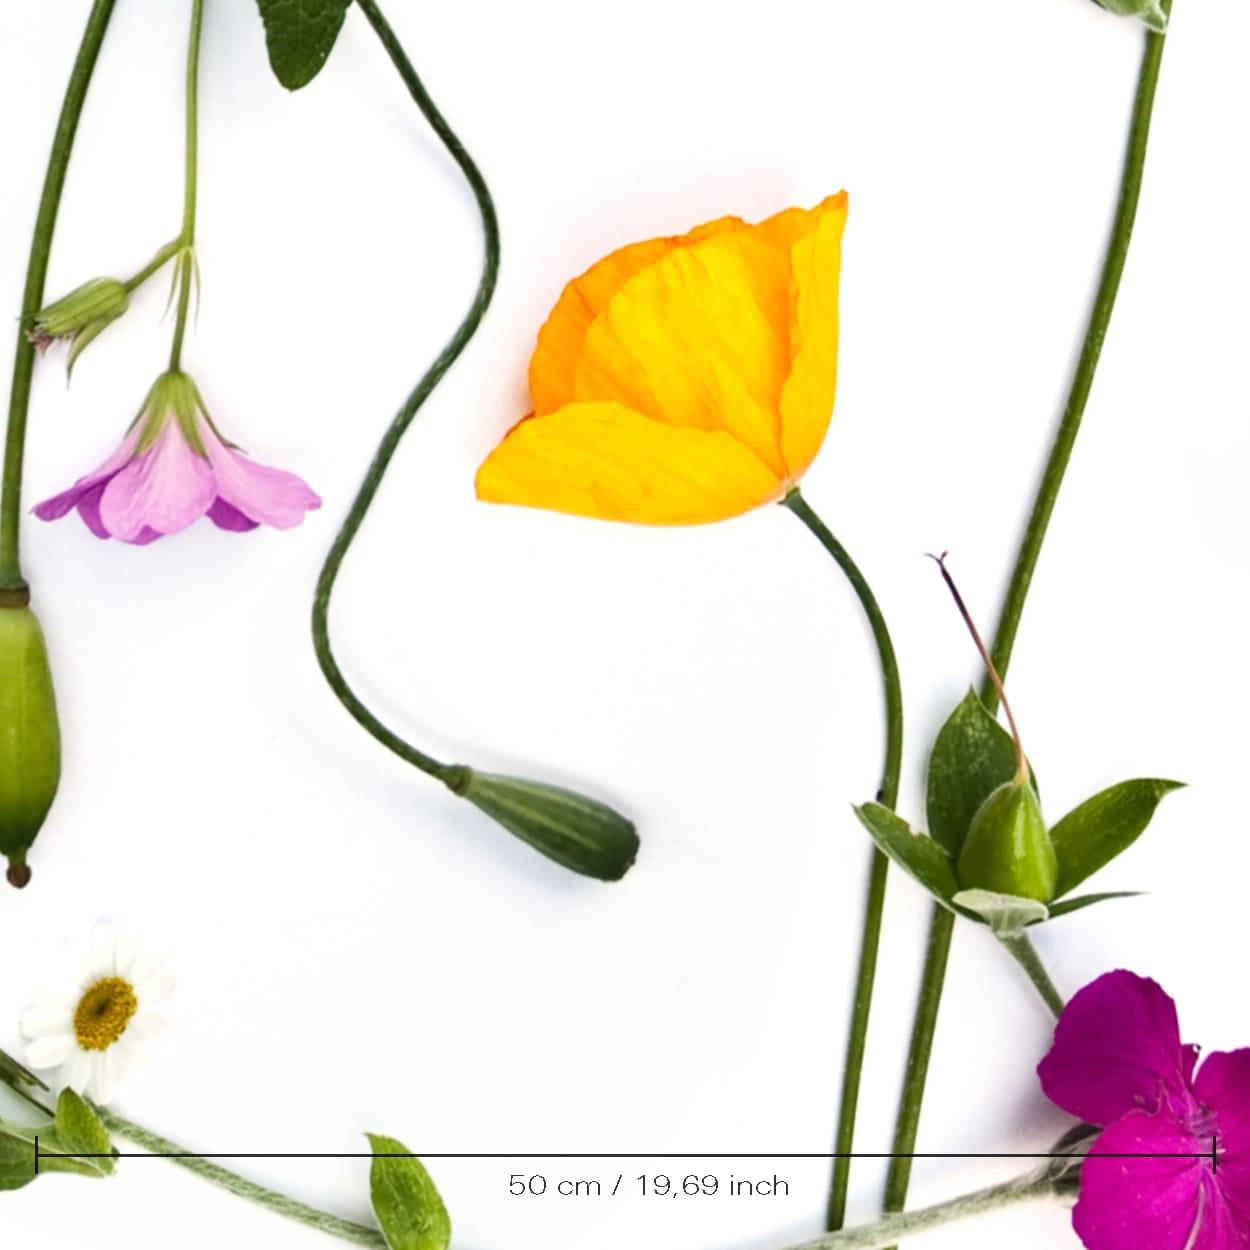 Wall covering flowers leaves riverside yellow poppy muurbloem muurbloem design studio mightylinksfo